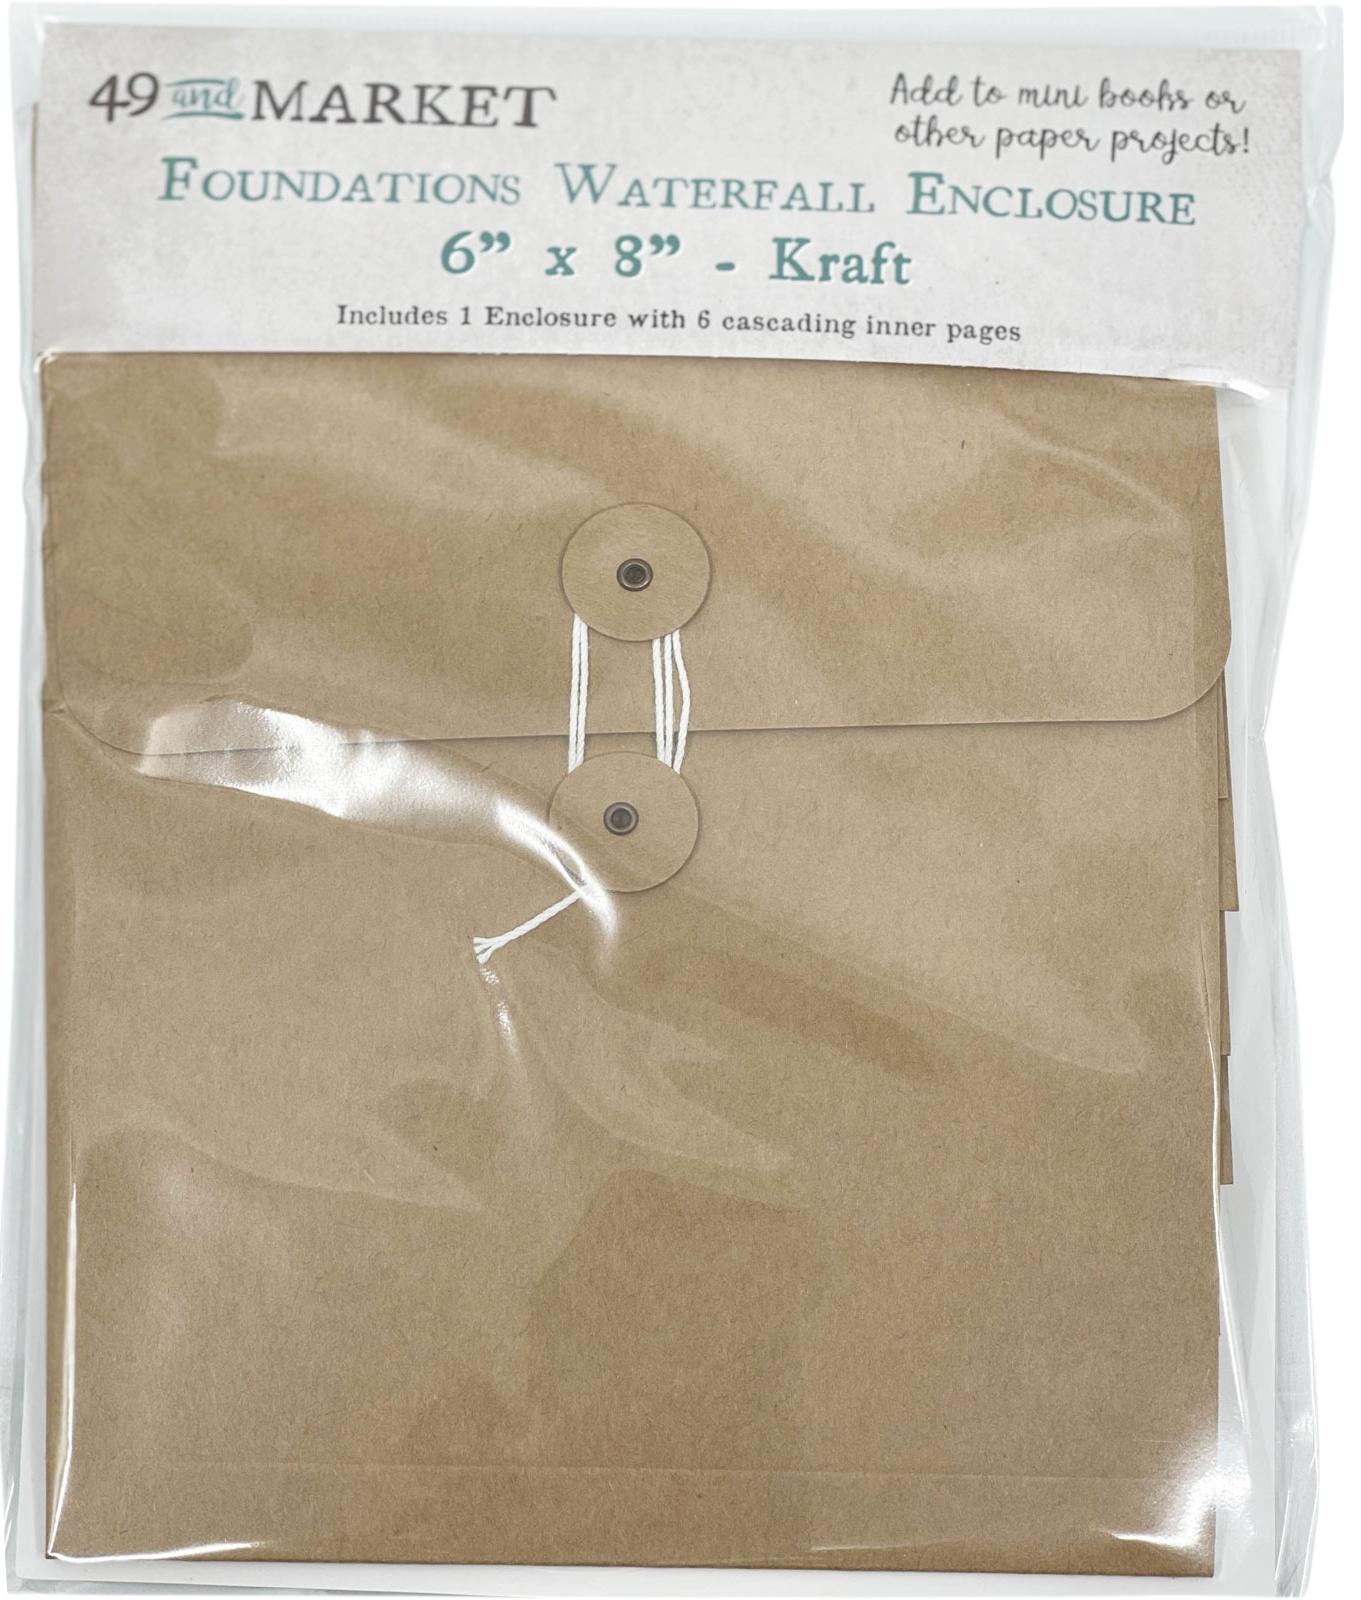 49 And Market Foundations Waterfall Enclosure 6X8-Kraft